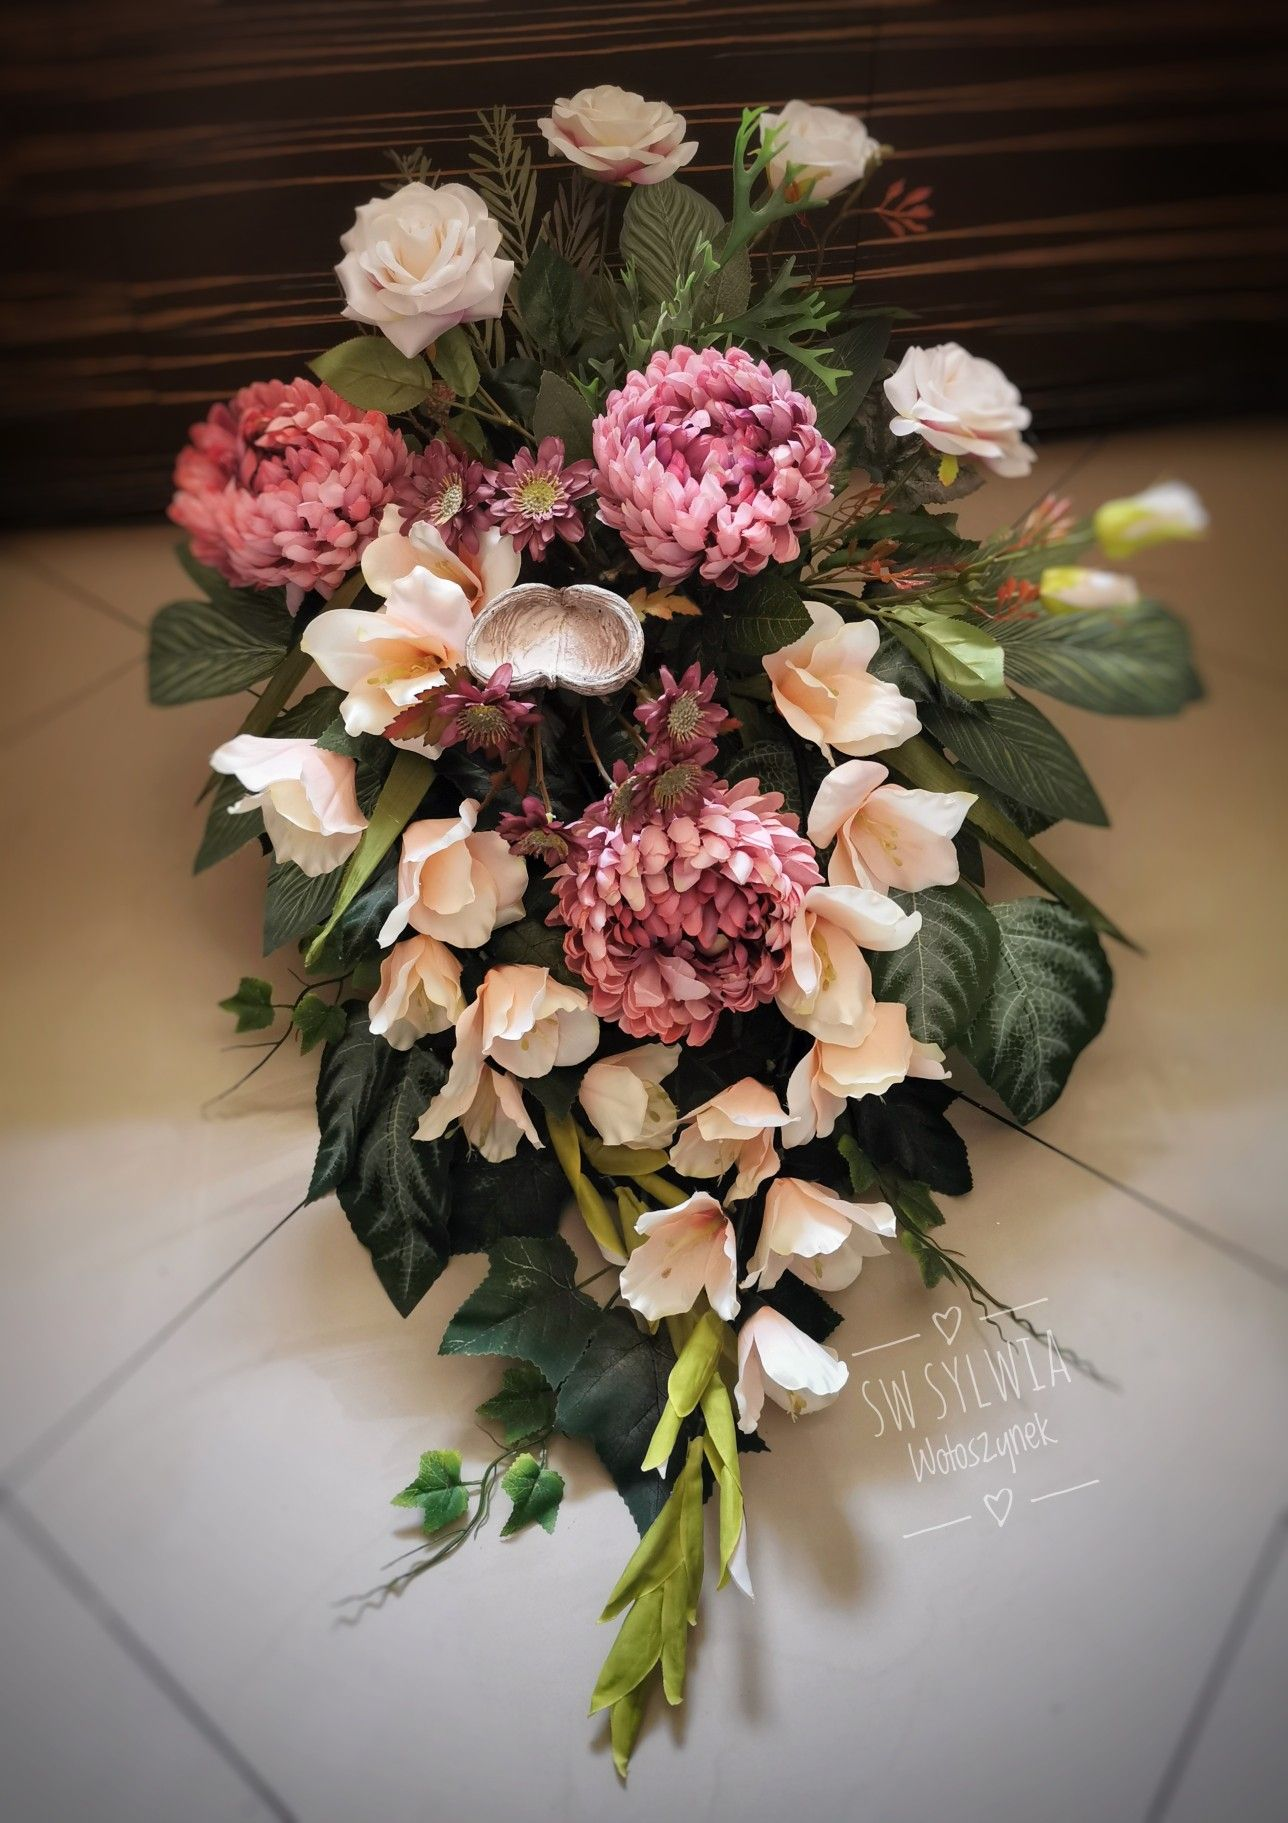 Kompozycja Nagrobna 2019 Floral Wreath Floral Funeral